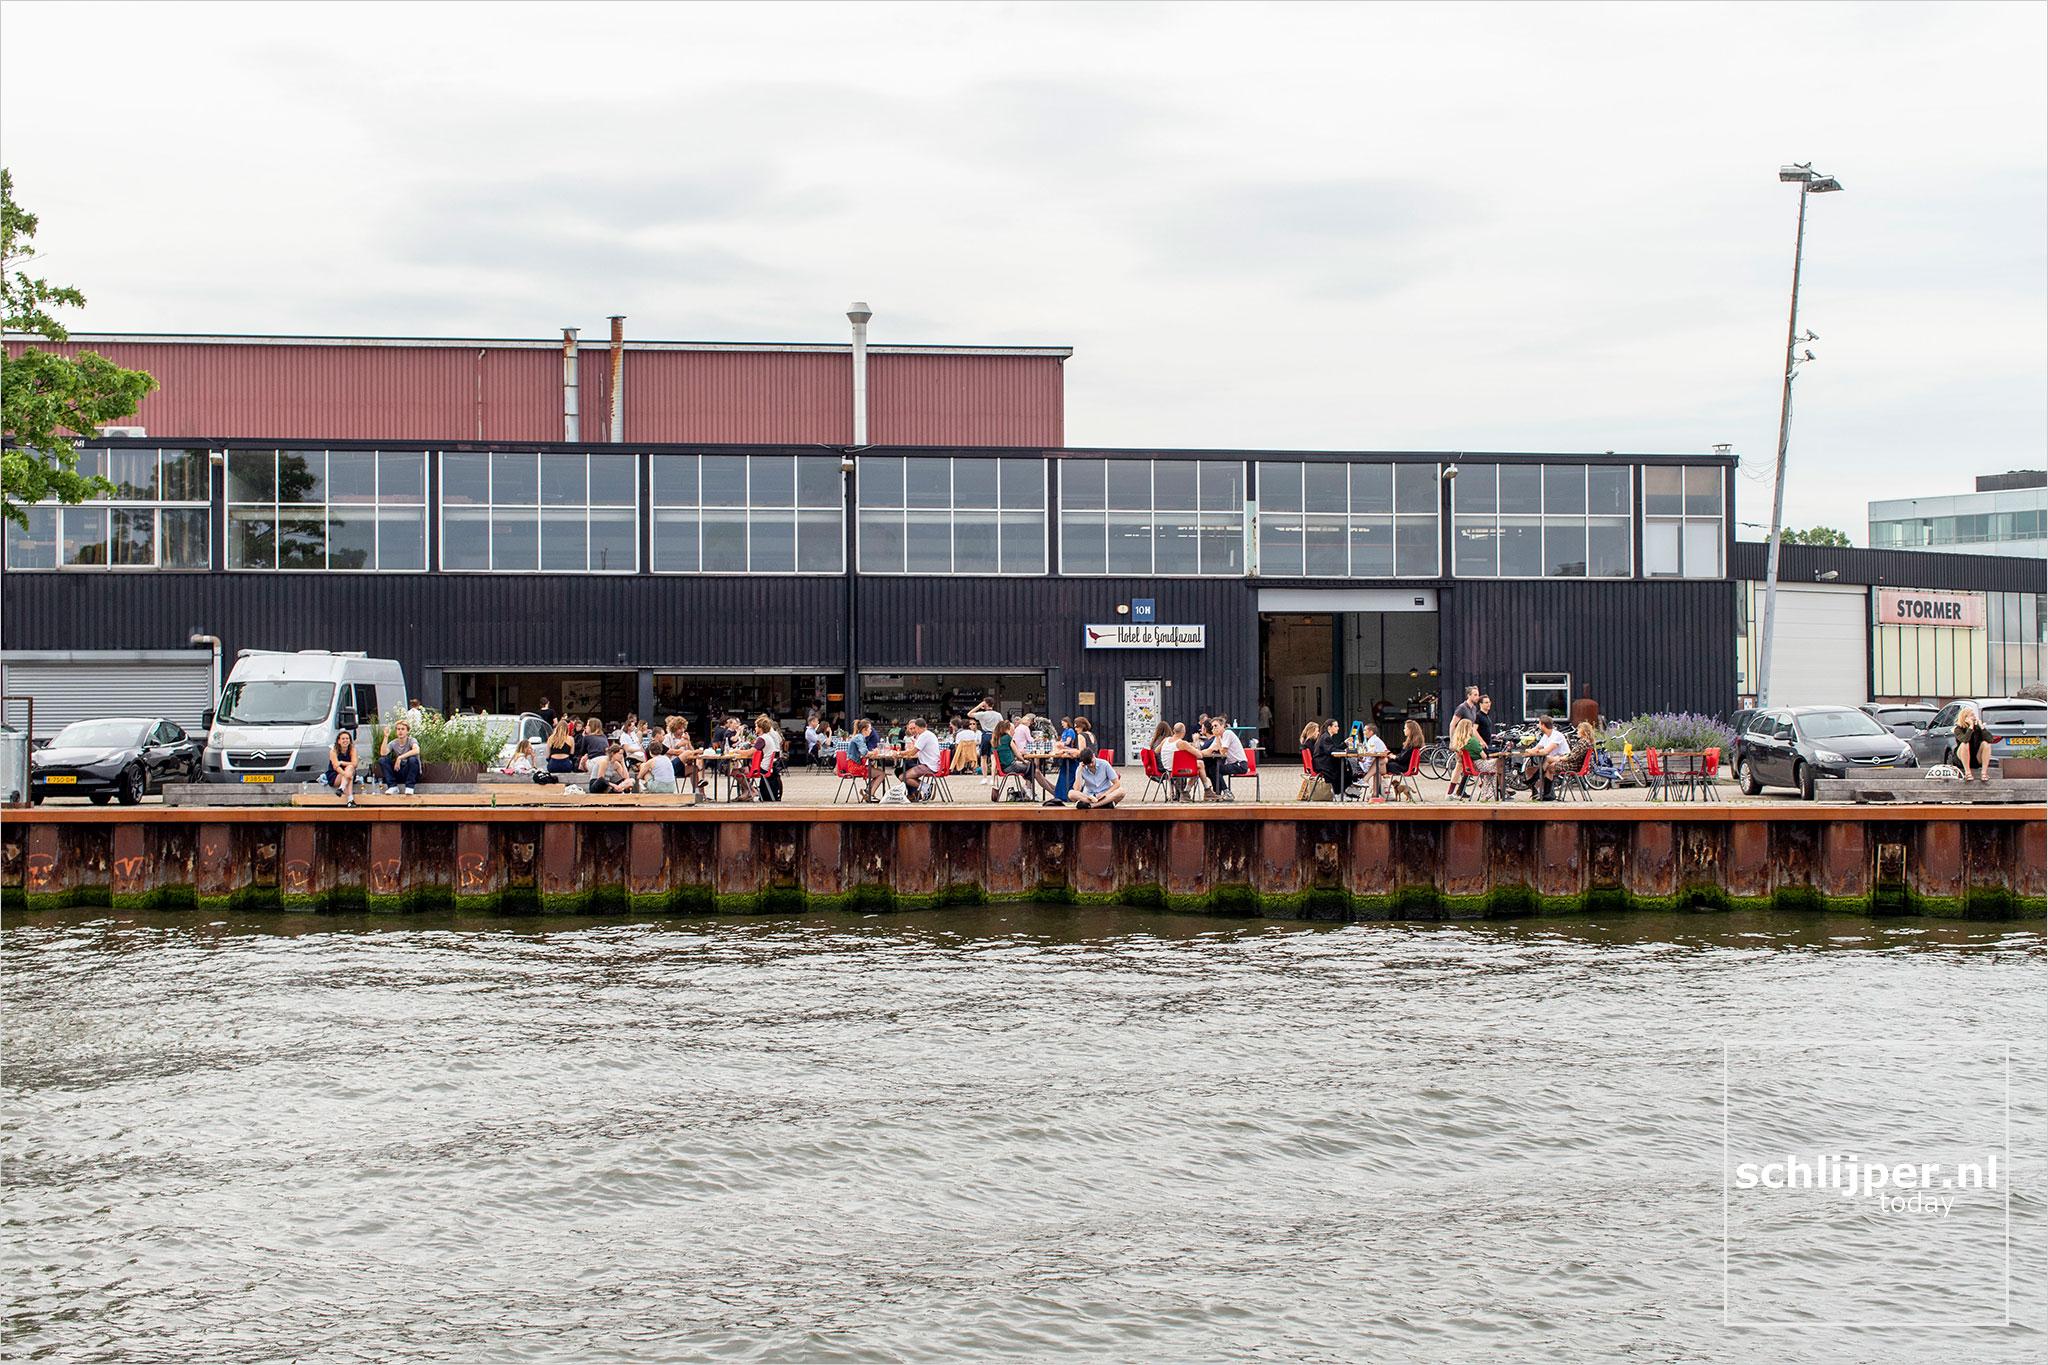 The Netherlands, Amsterdam, 4 juni 2021